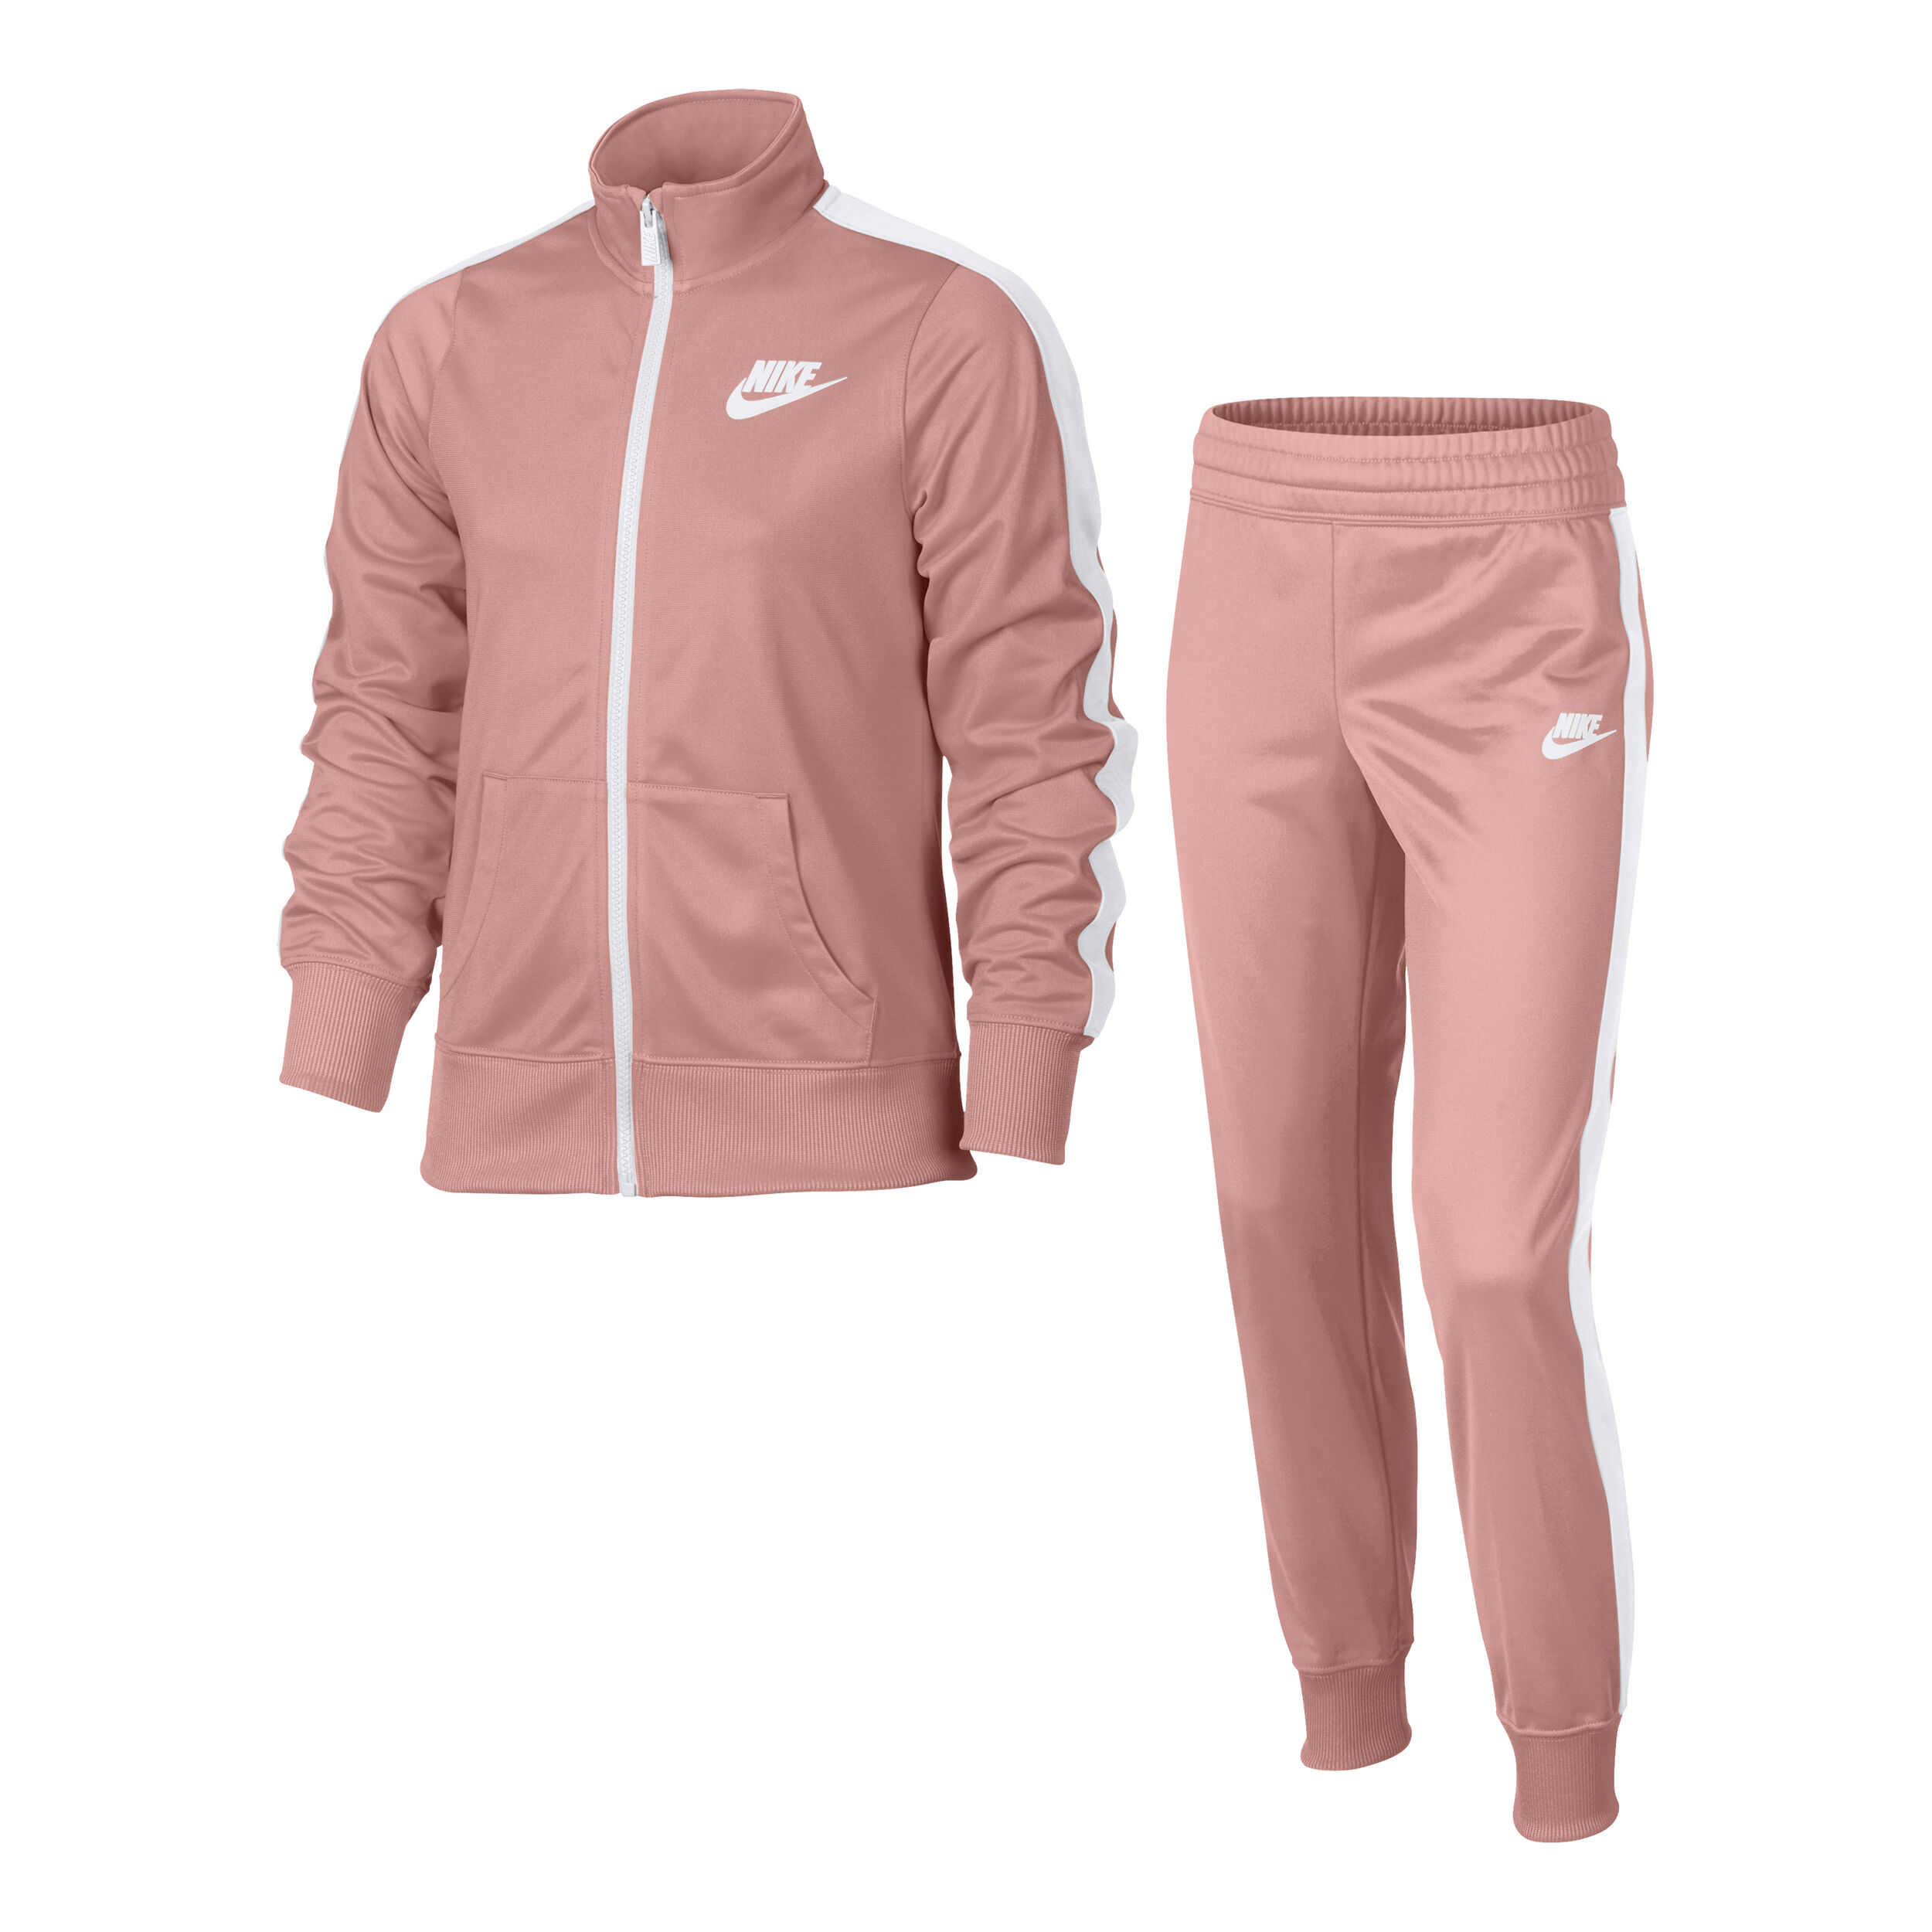 Nike Sportswear Tricot Trainingsanzug Mädchen - Rosa, Weiß